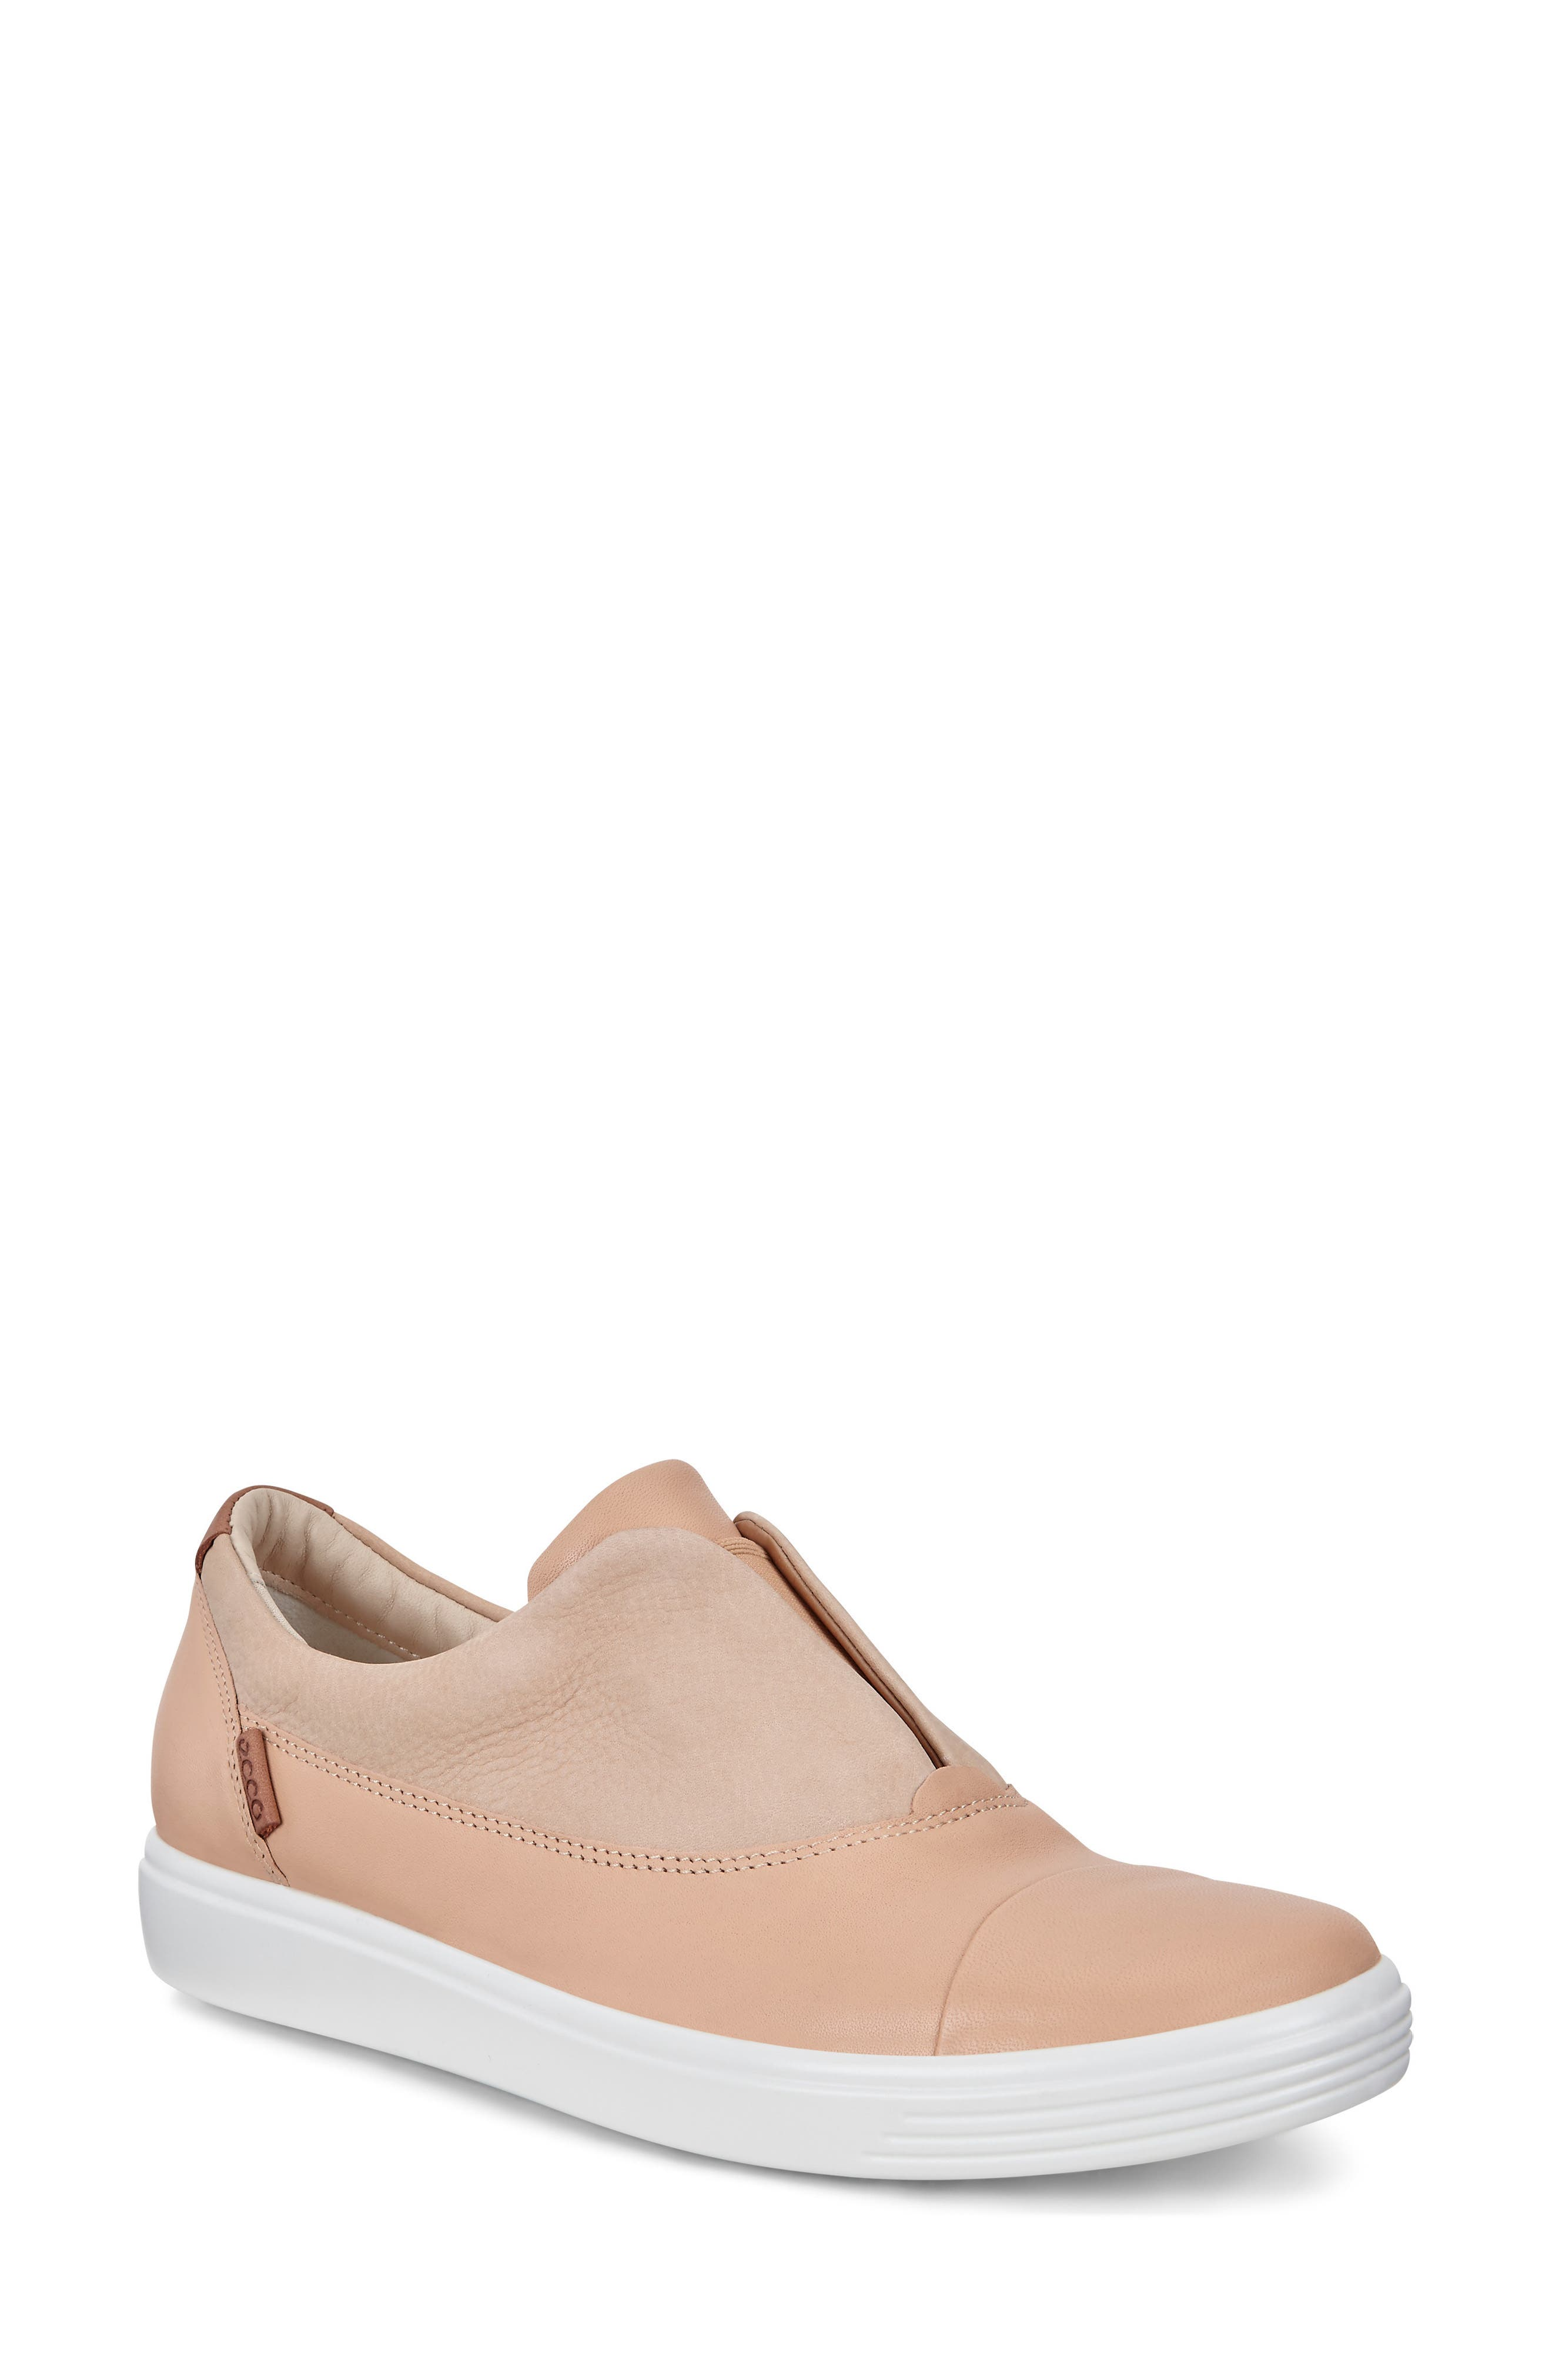 ,                             Soft 7 II Slip-On Sneaker,                             Main thumbnail 19, color,                             250